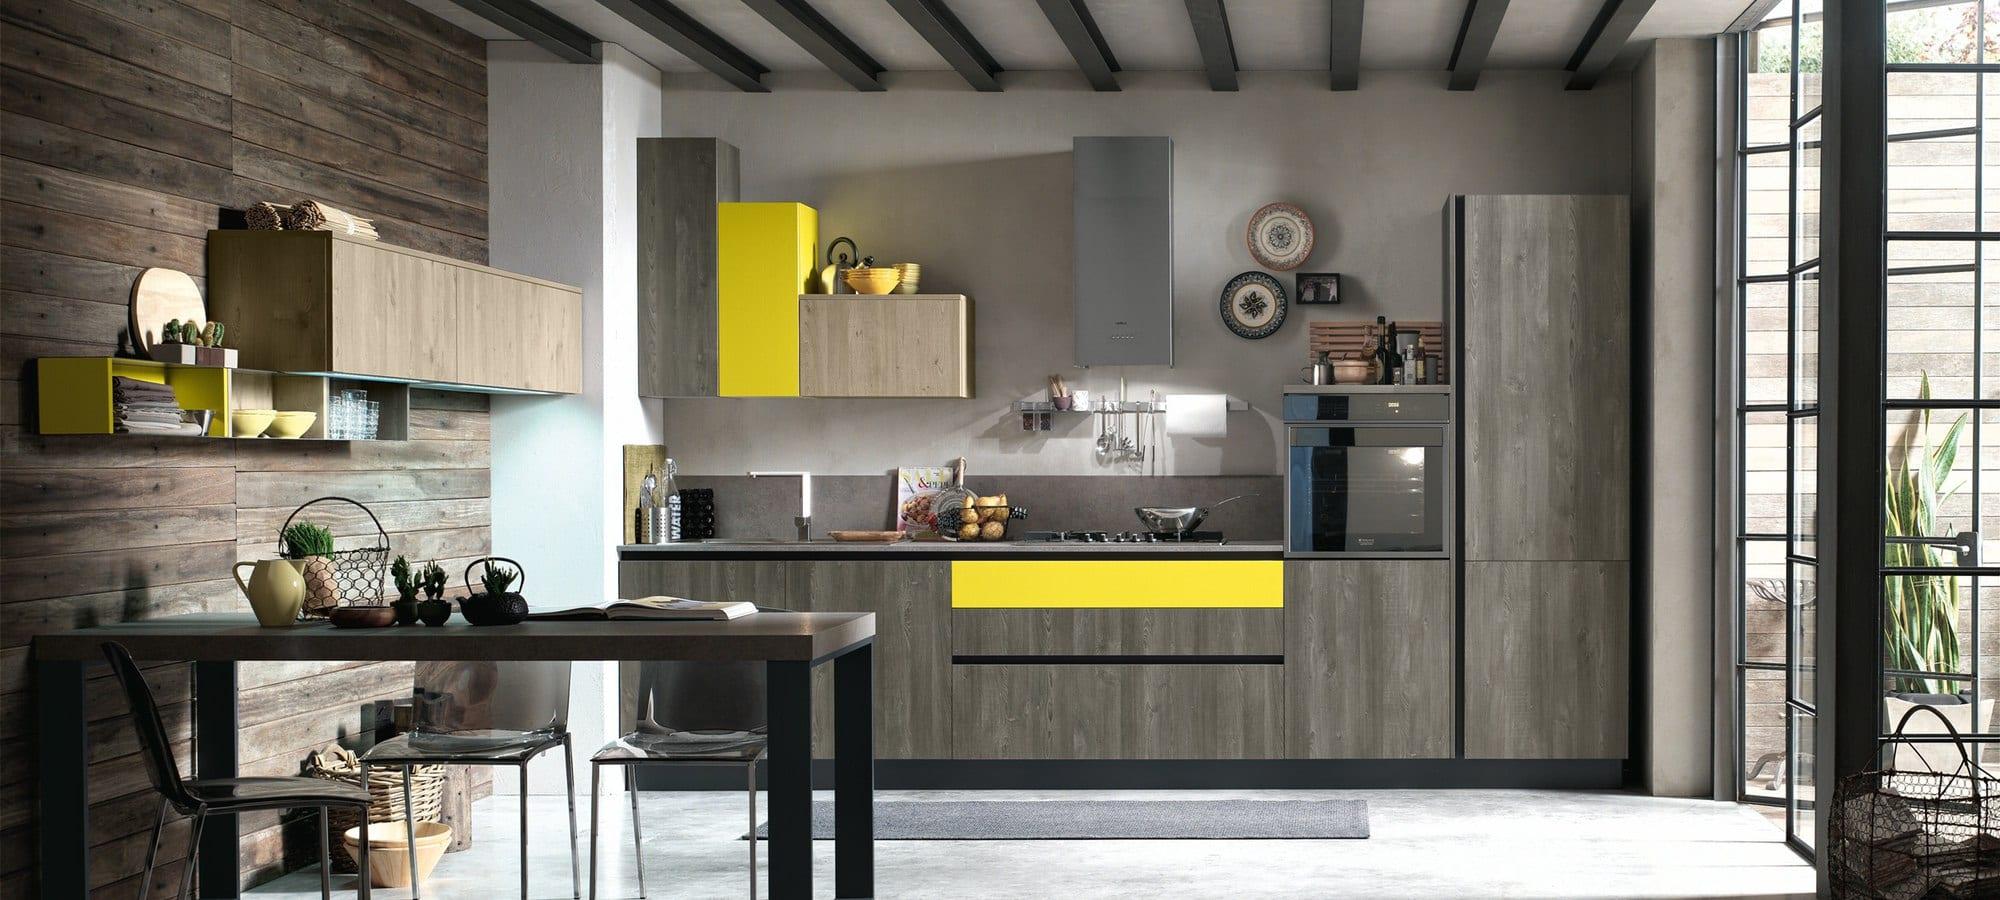 Cucina stosa raimondi idee casa - Cucine etniche arredamento ...